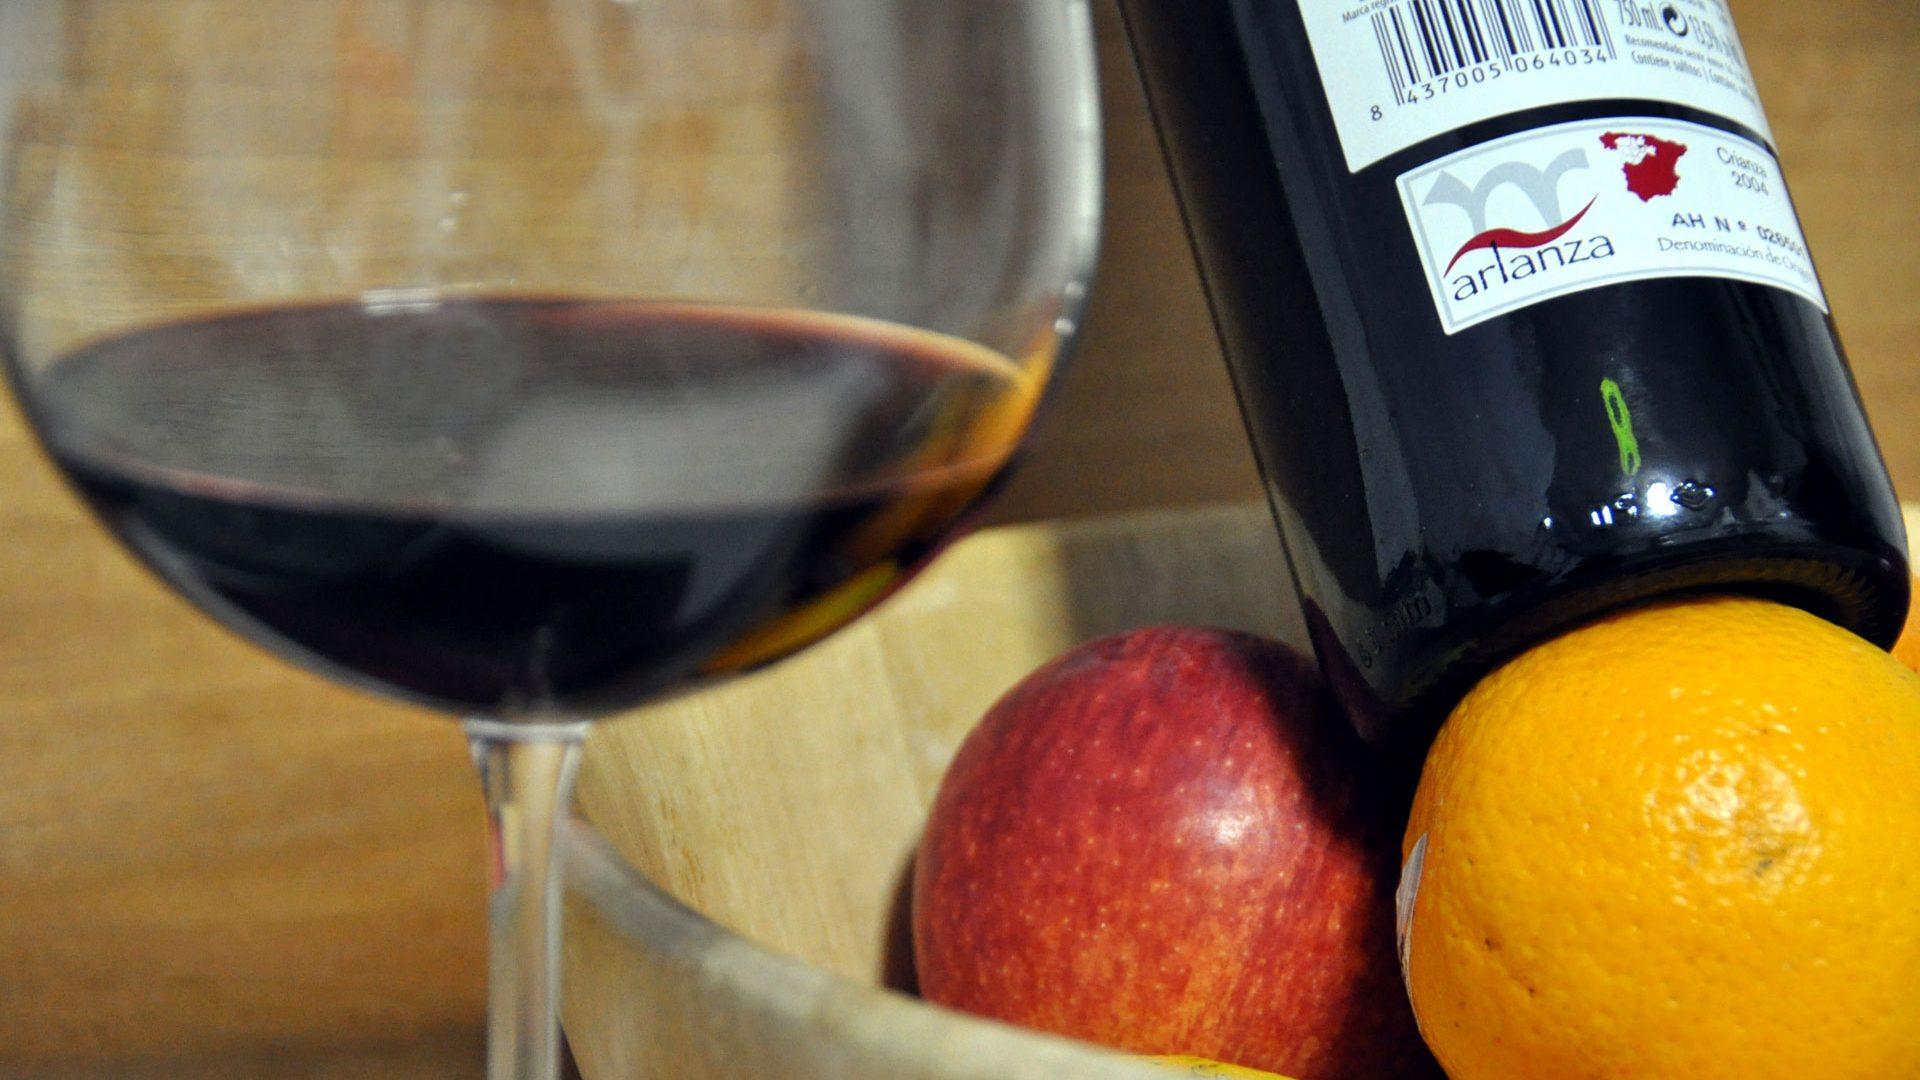 Ruta del Vino Arlanza